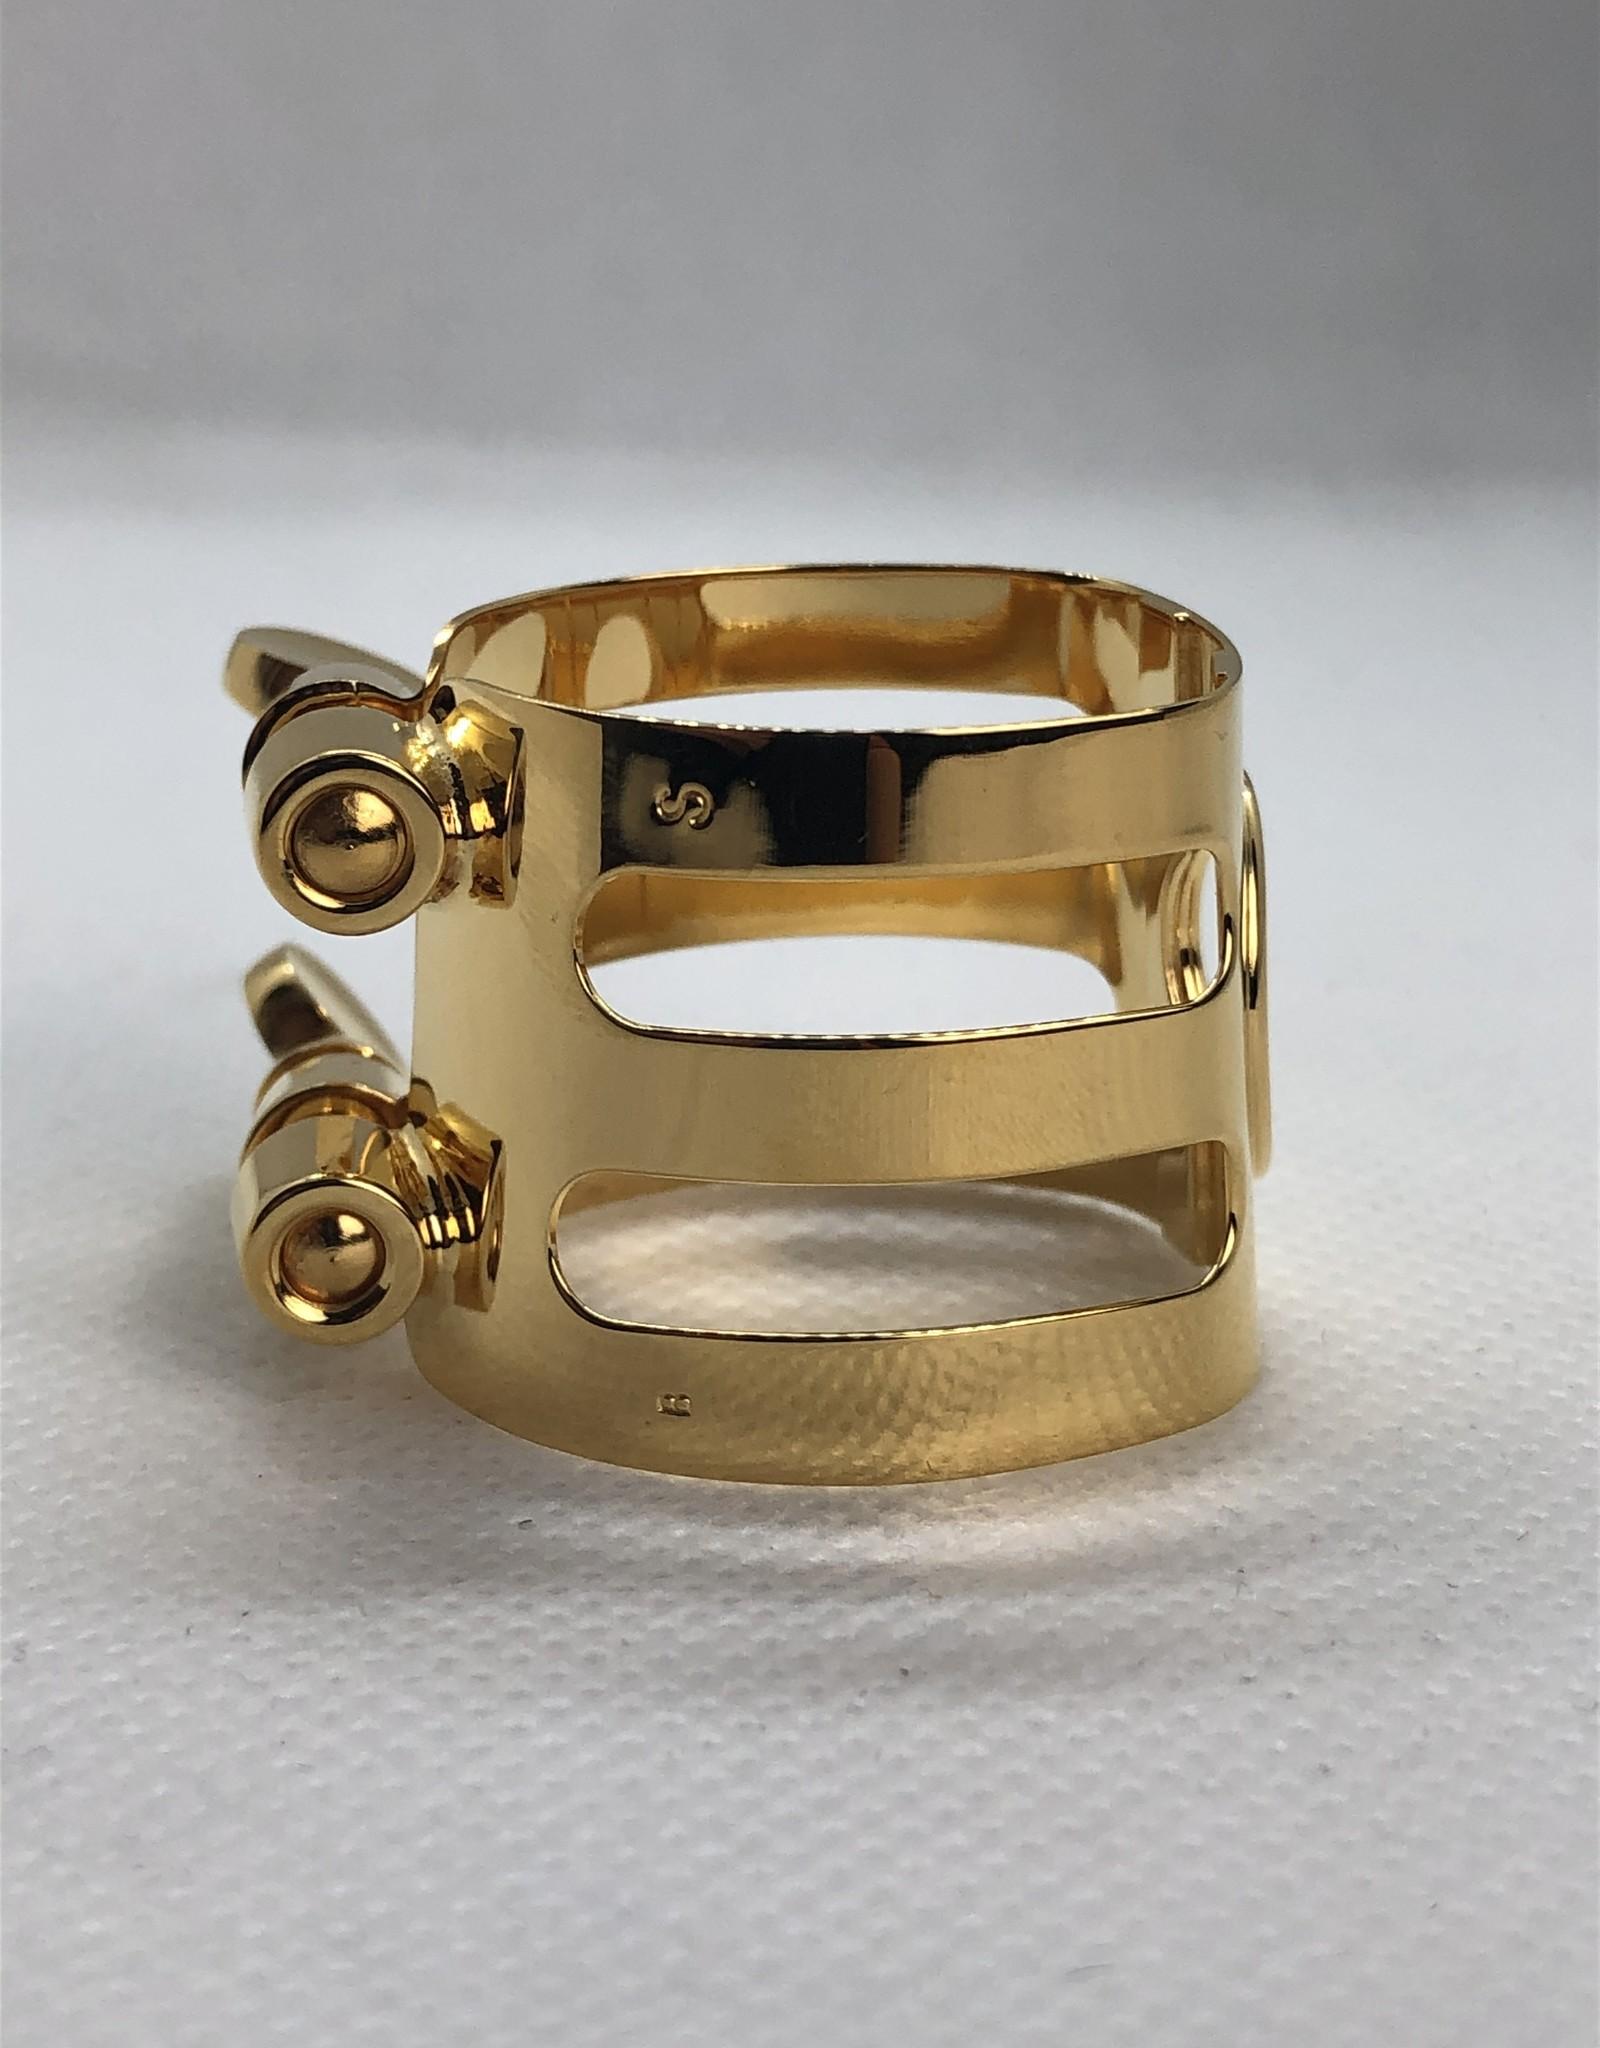 Ishimori Wood Stone Alto Saxophone Metal Ligature for Selmer Rubber Mouthpiece Gold Plated